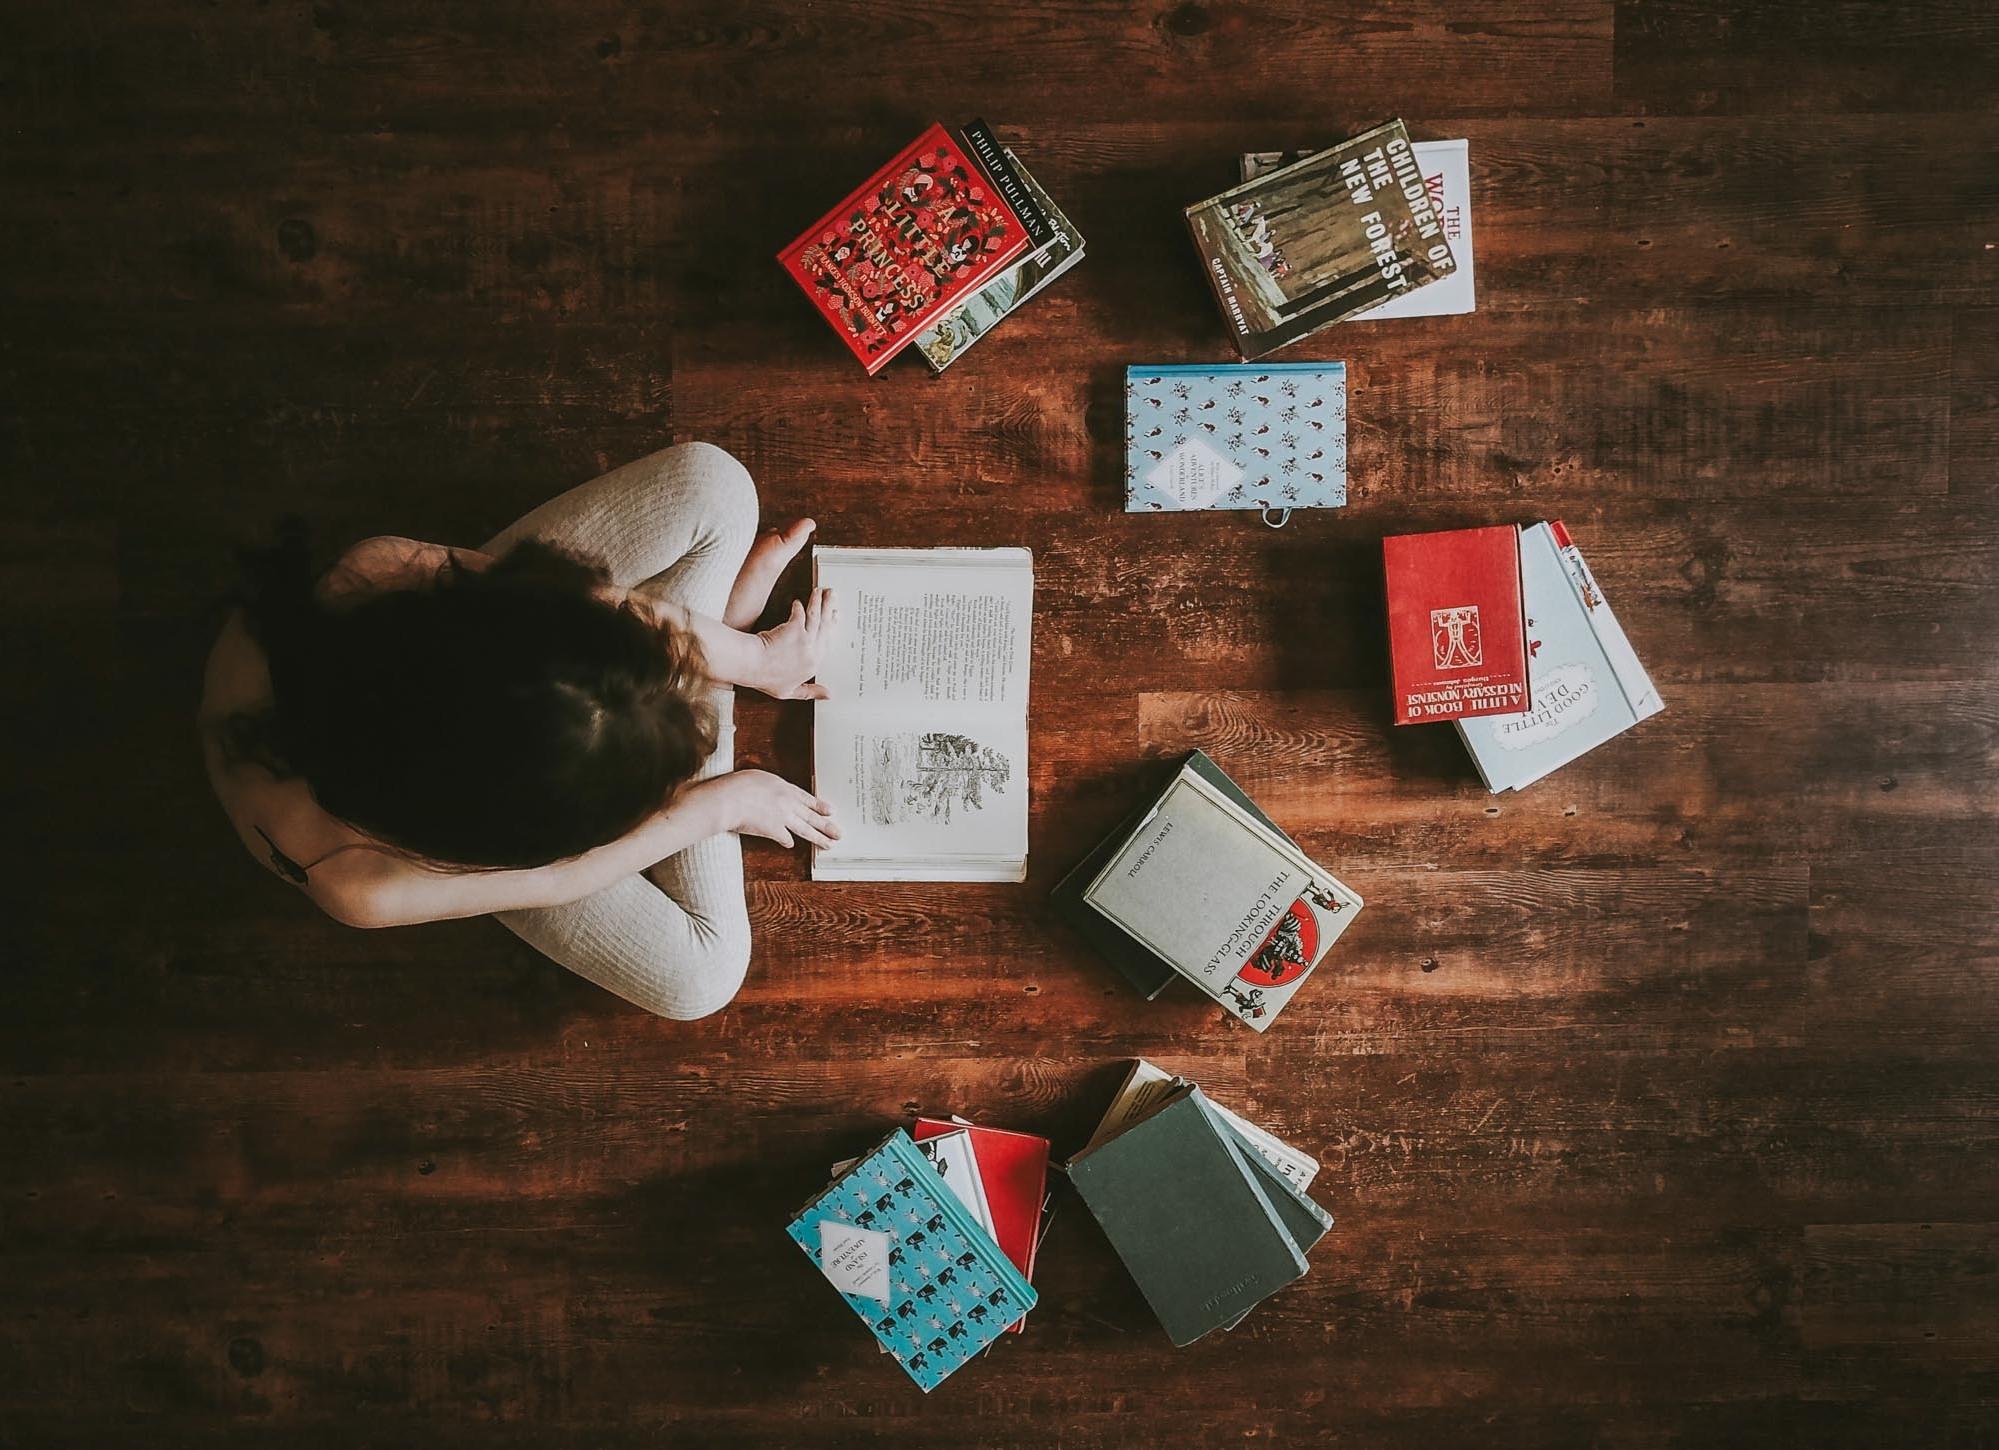 20-reasons-why-we-homeschool-2b